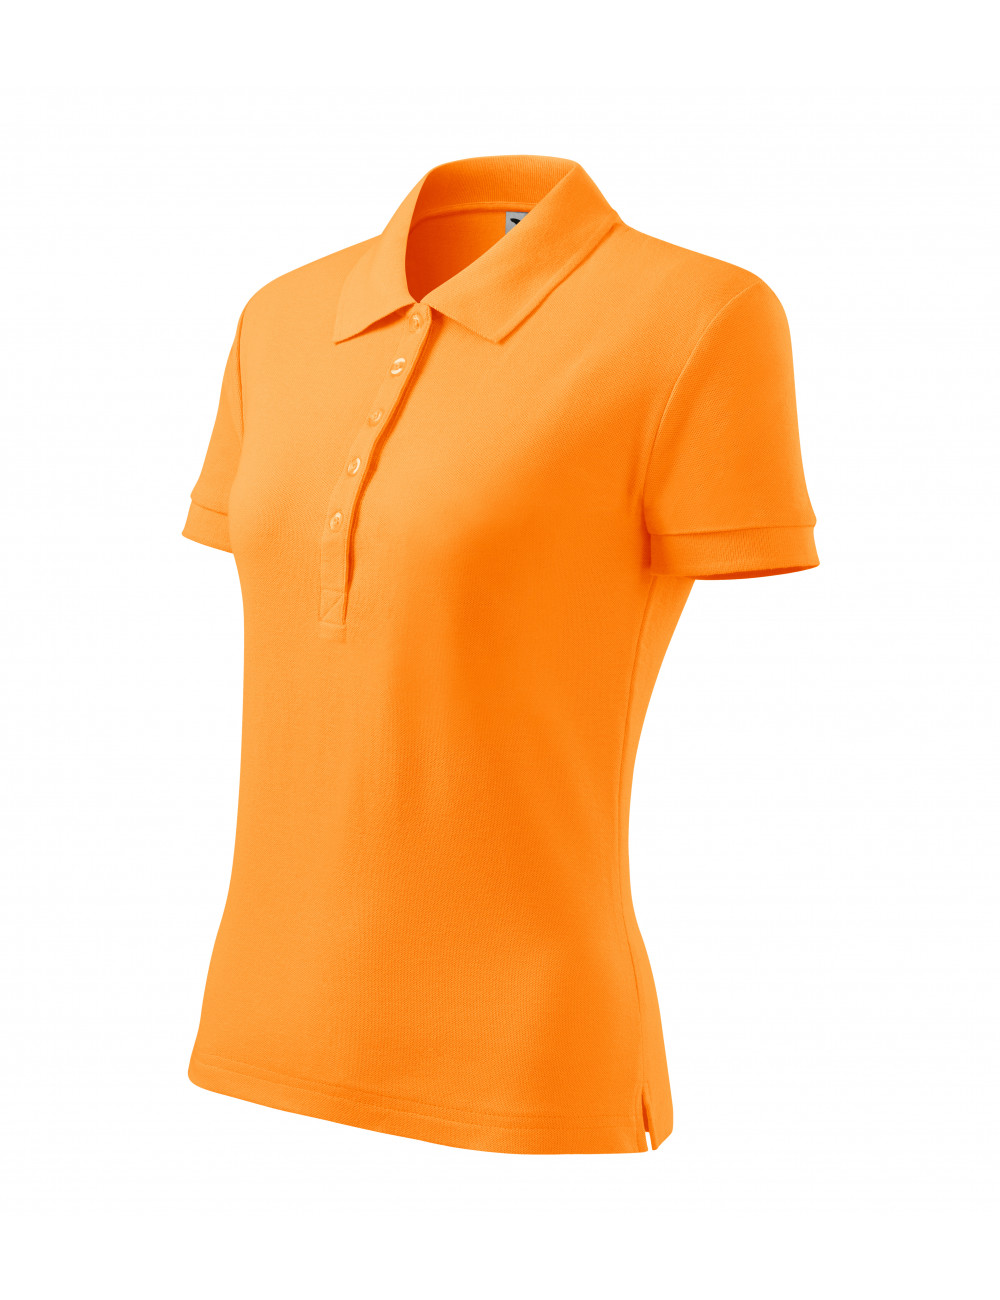 Adler MALFINI Koszulka polo damska Cotton 213 mandarynkowy